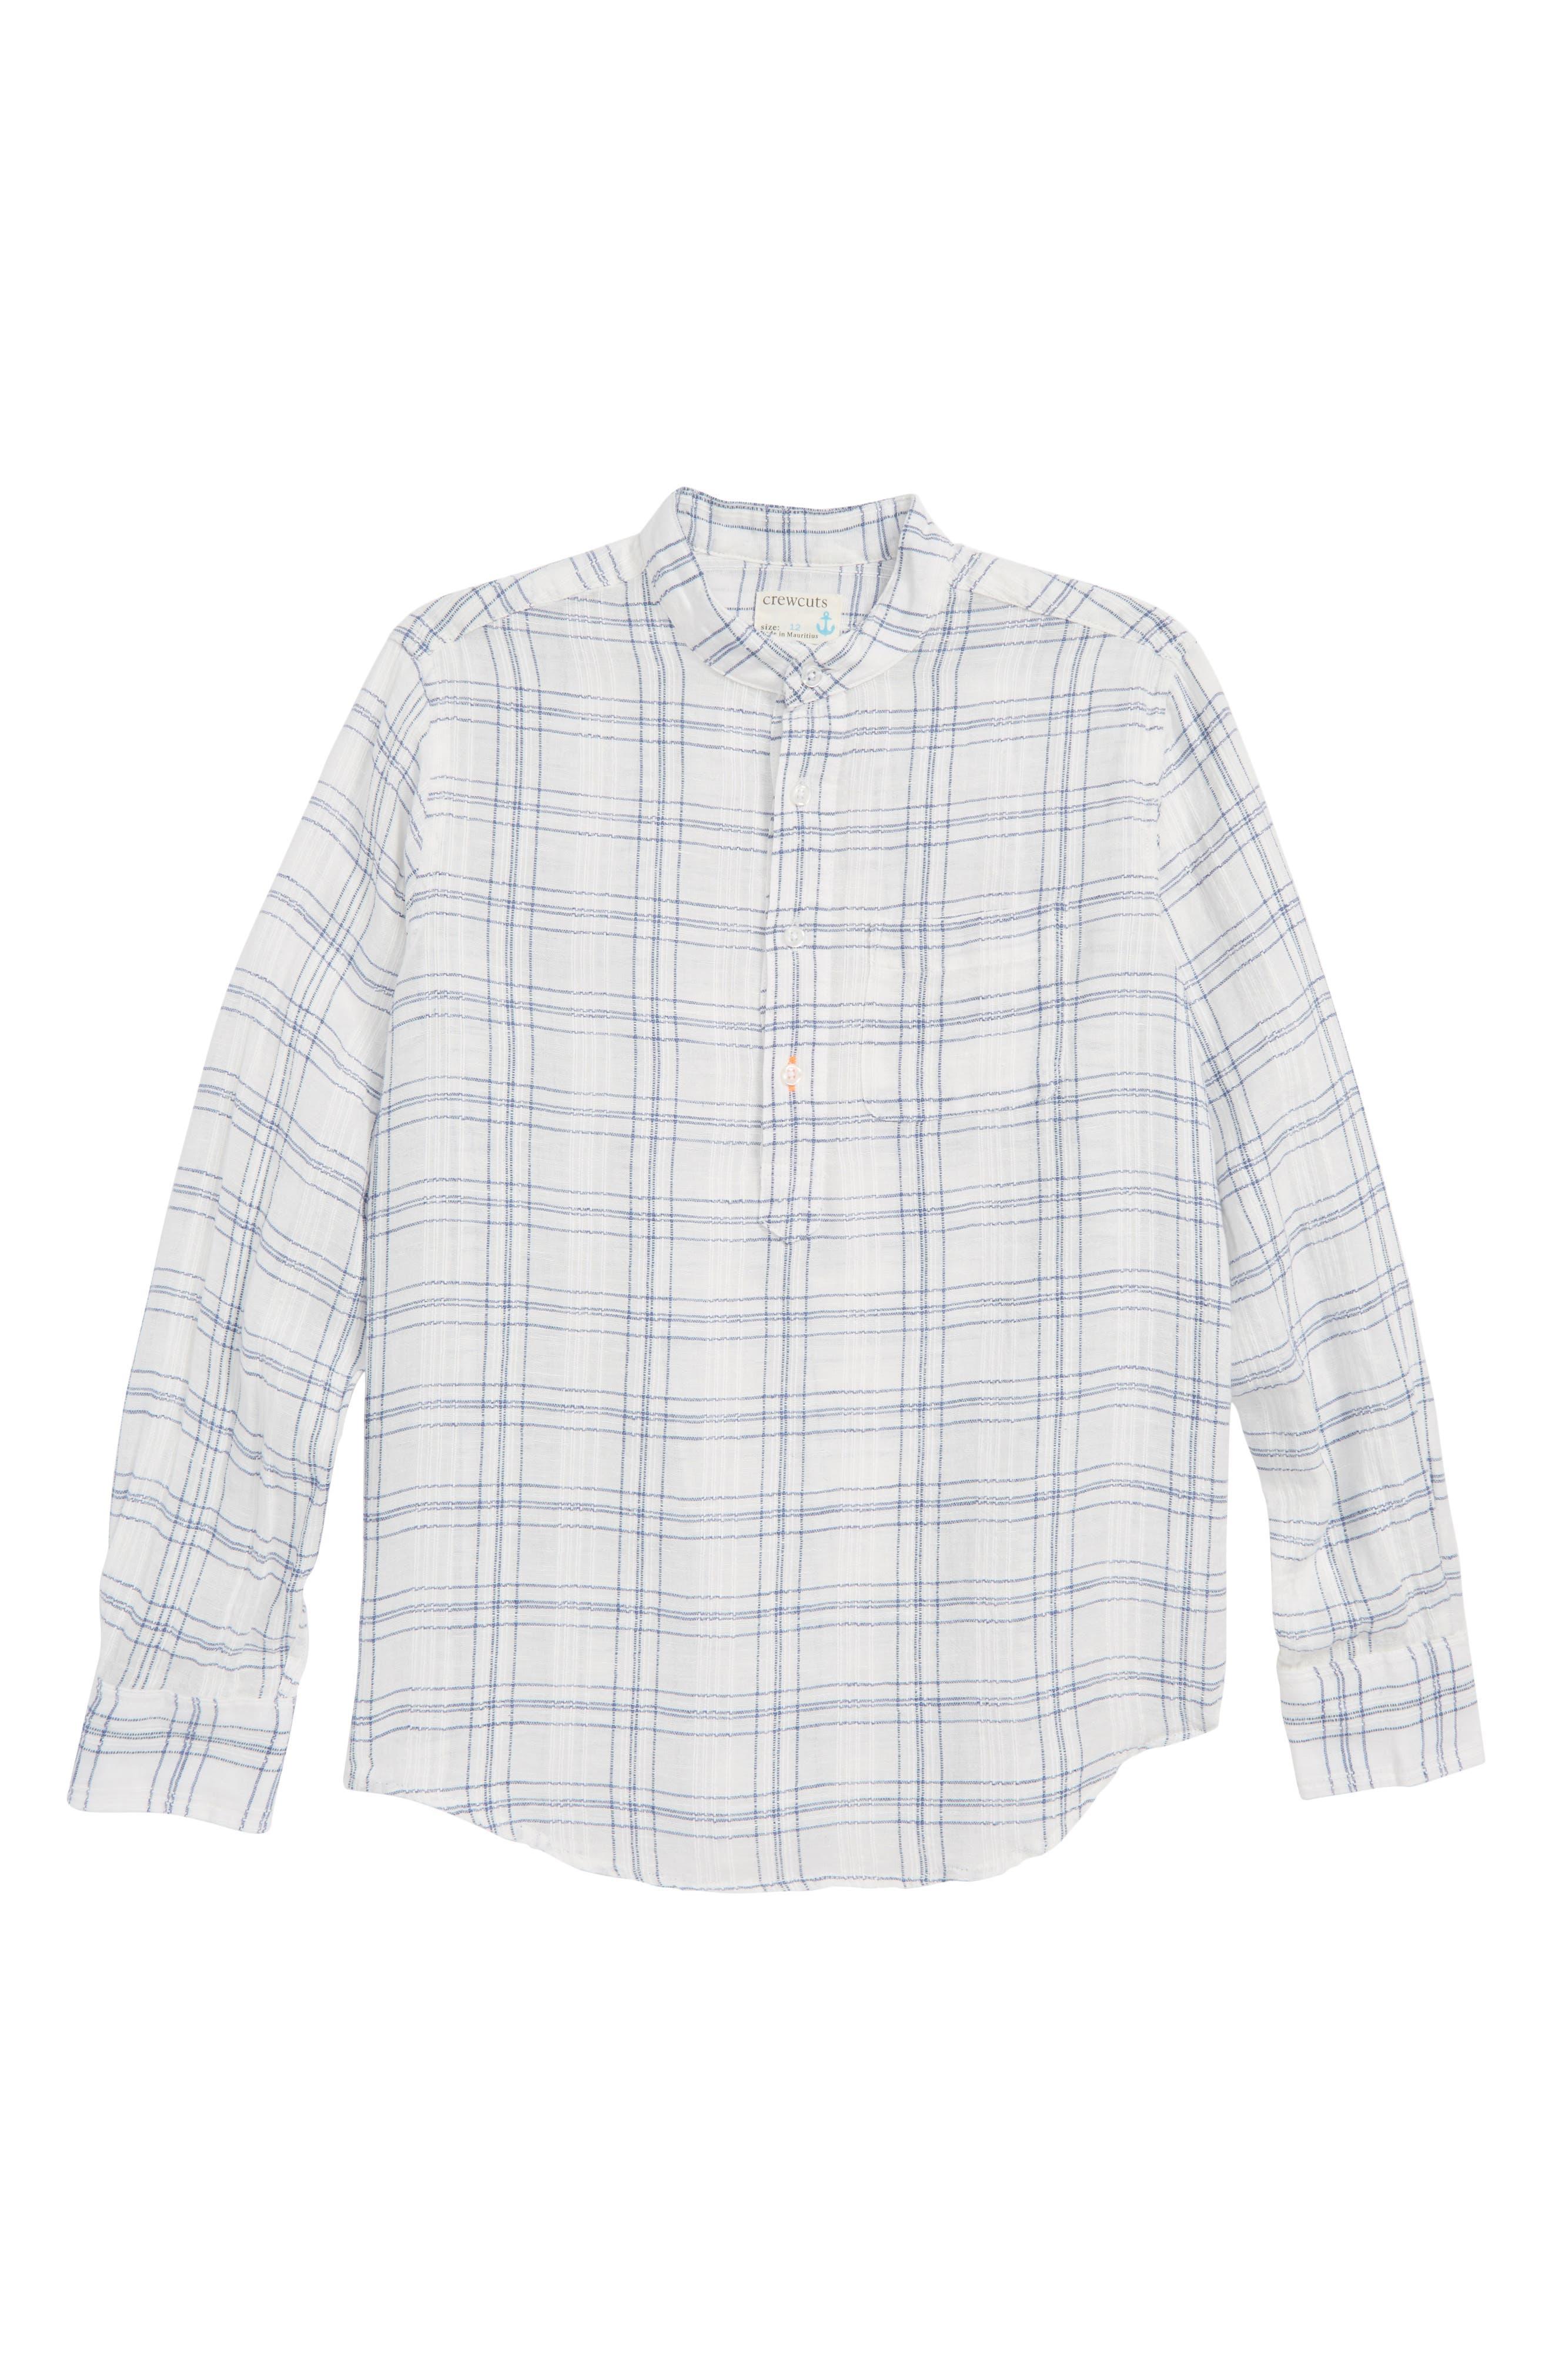 CREWCUTS BY J.CREW,                             Windowpane Band Collar Linen Blend Shirt,                             Main thumbnail 1, color,                             900